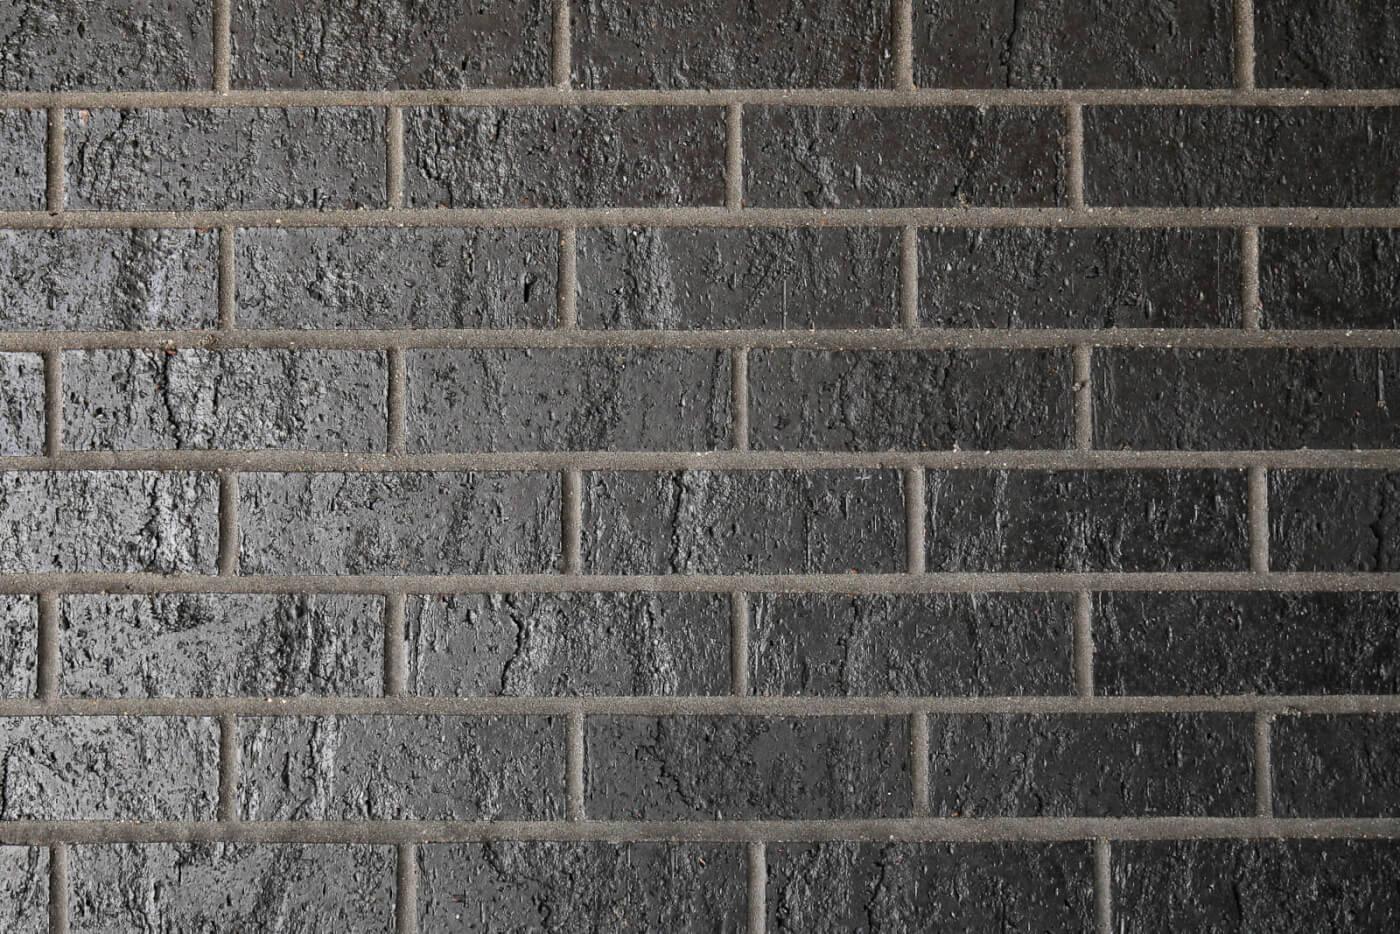 Midnight Black Brick Luxury Home Littlehampton Brick Rs 5